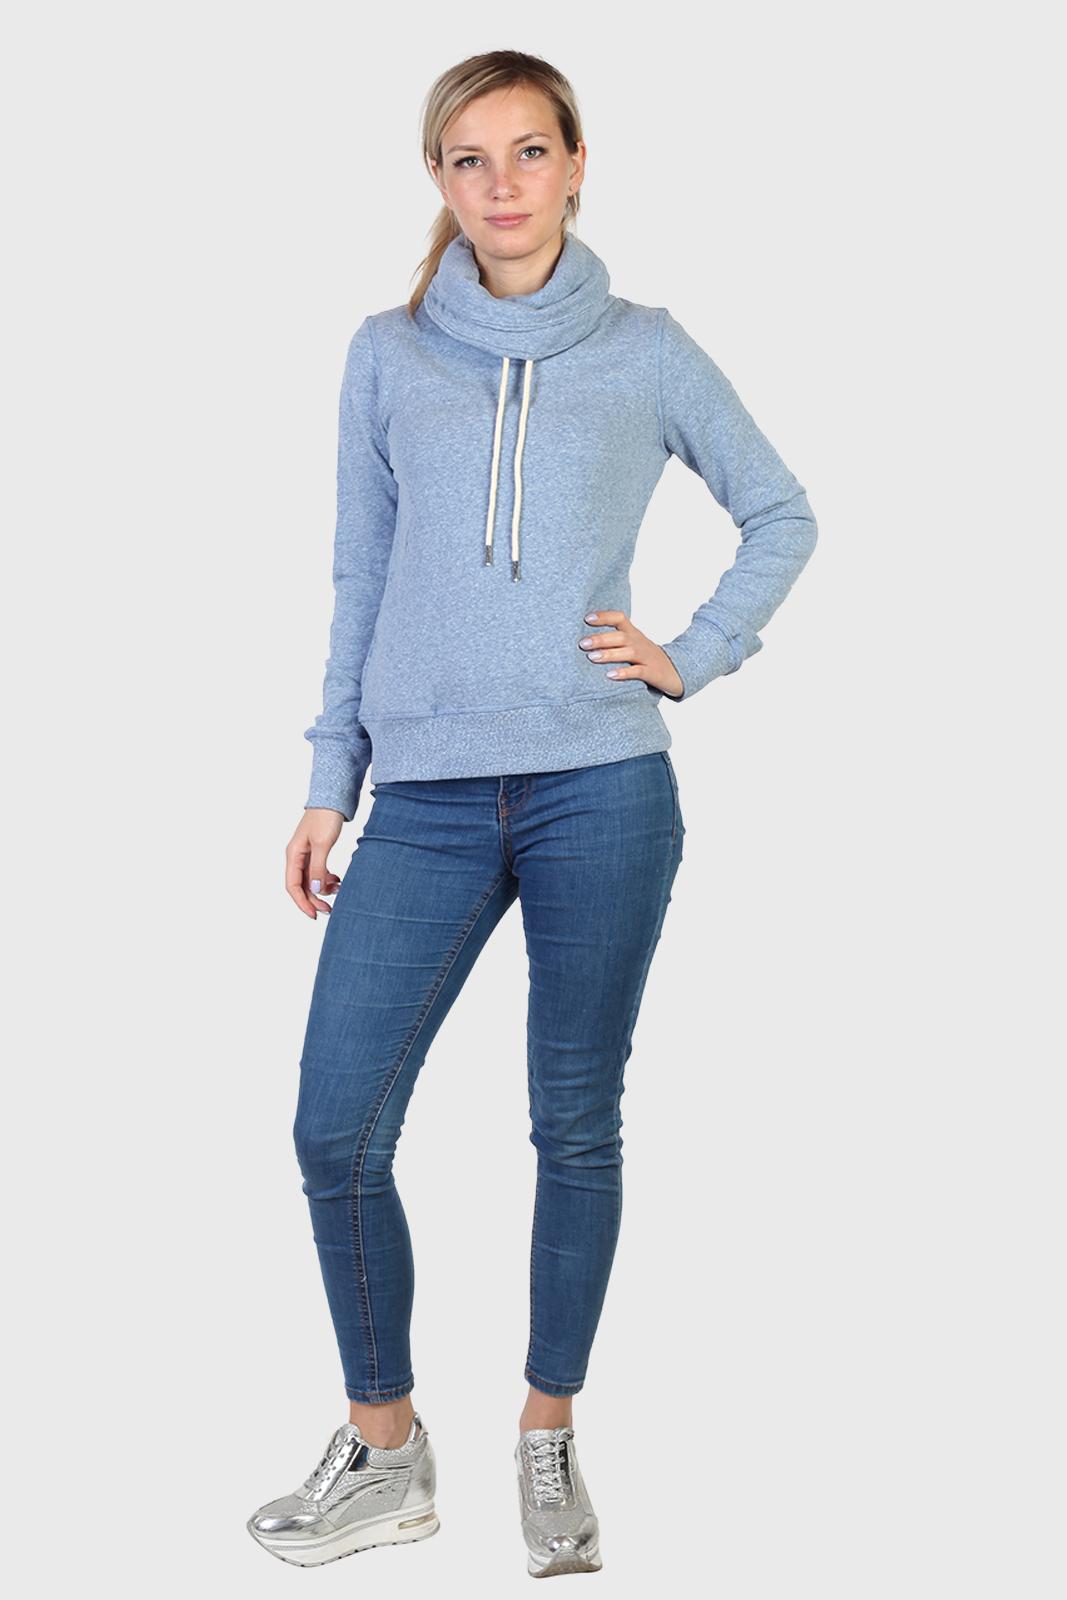 Женский свитер худи Barbados